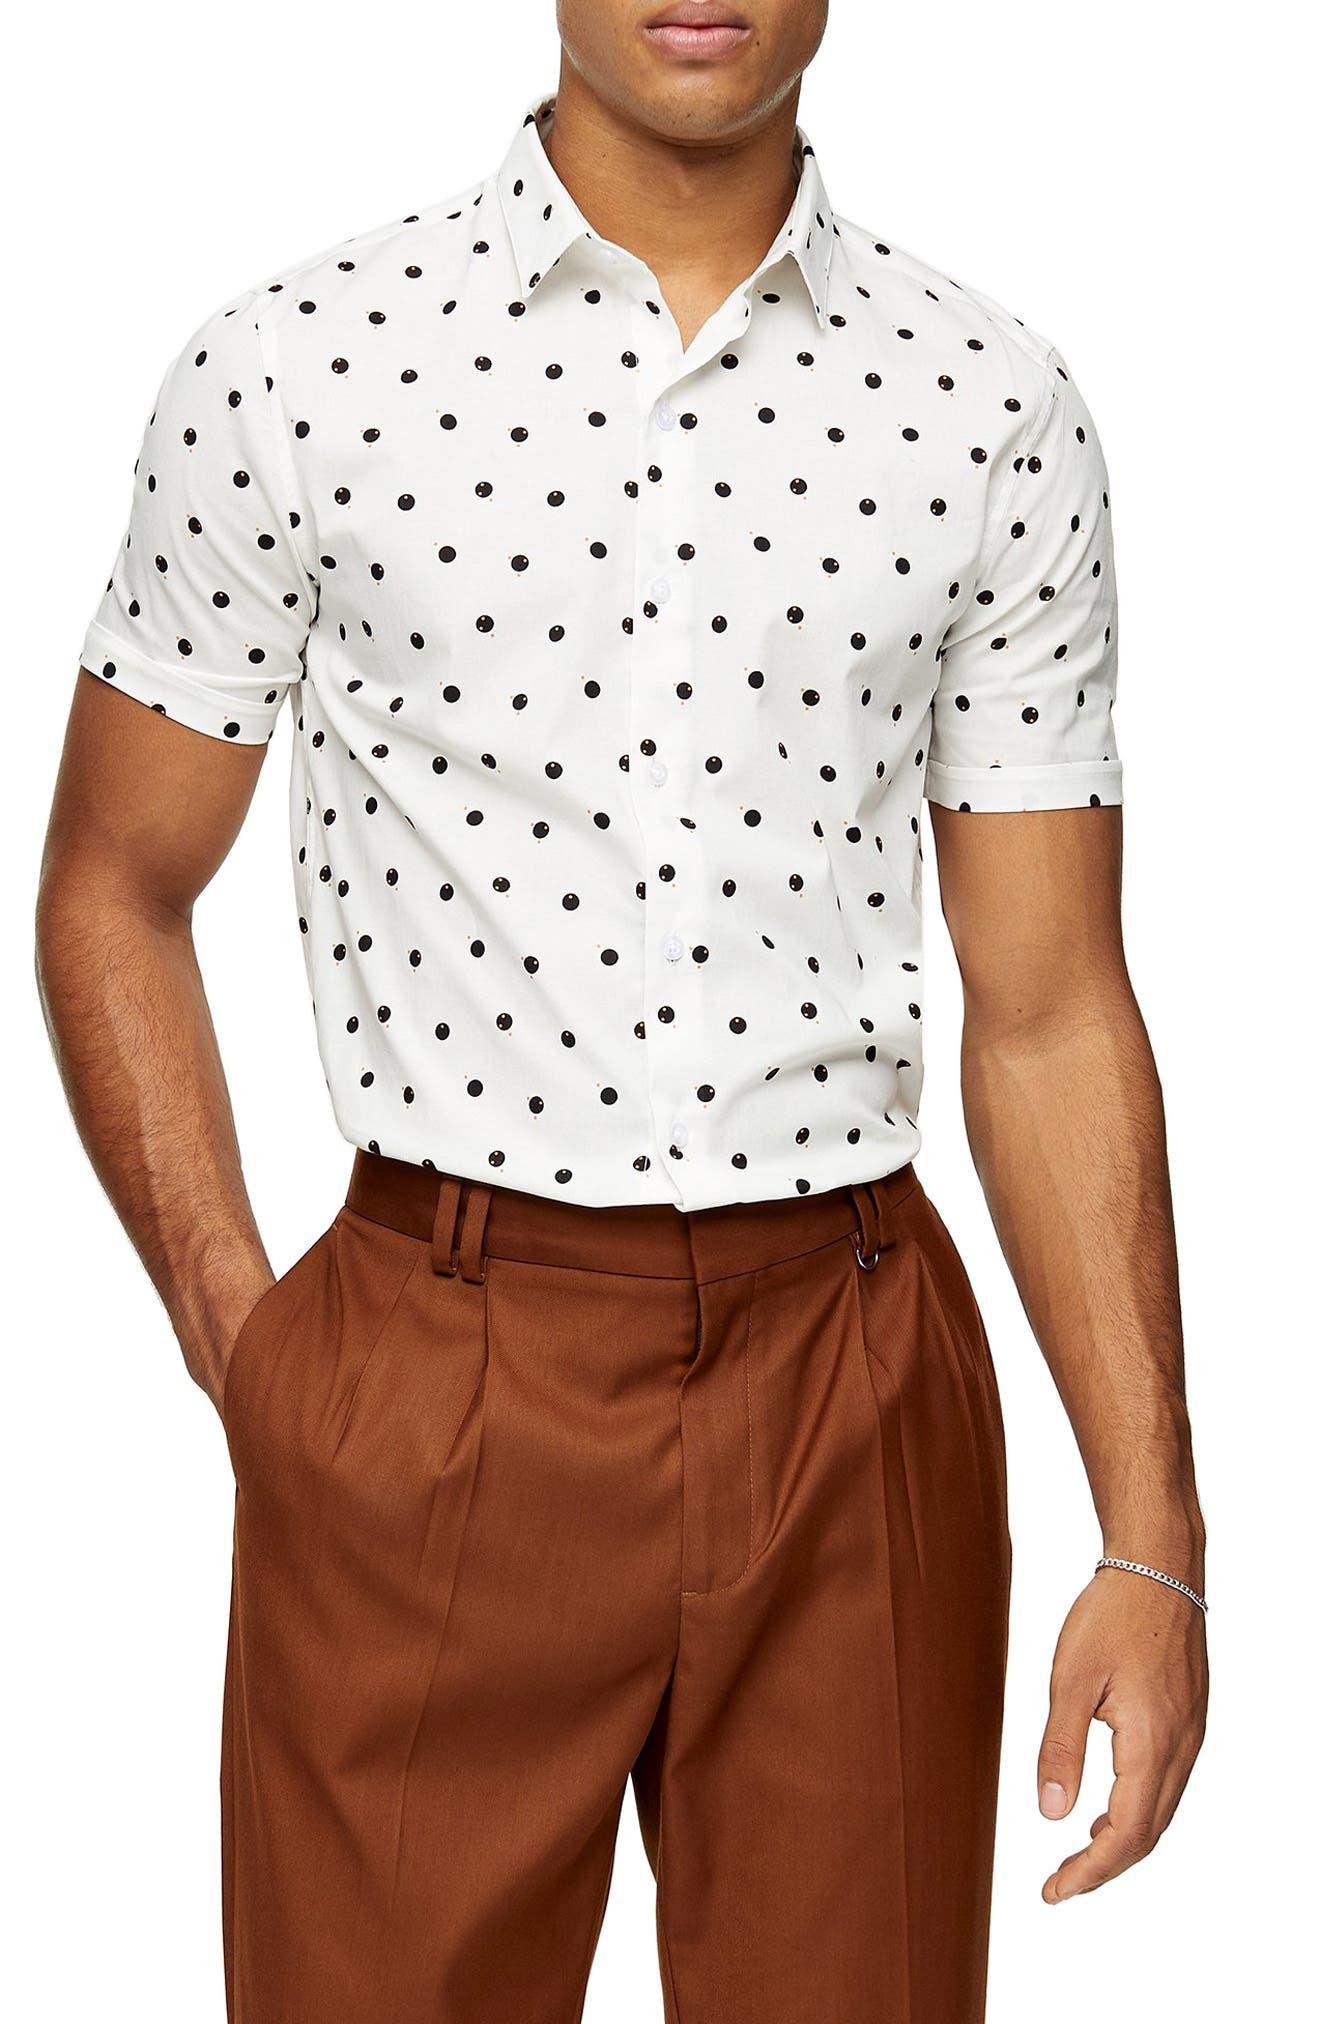 Mens Vintage Shirts – Retro Shirts Mens Topman Double Dot Short Sleeve Button-Up Shirt $45.00 AT vintagedancer.com